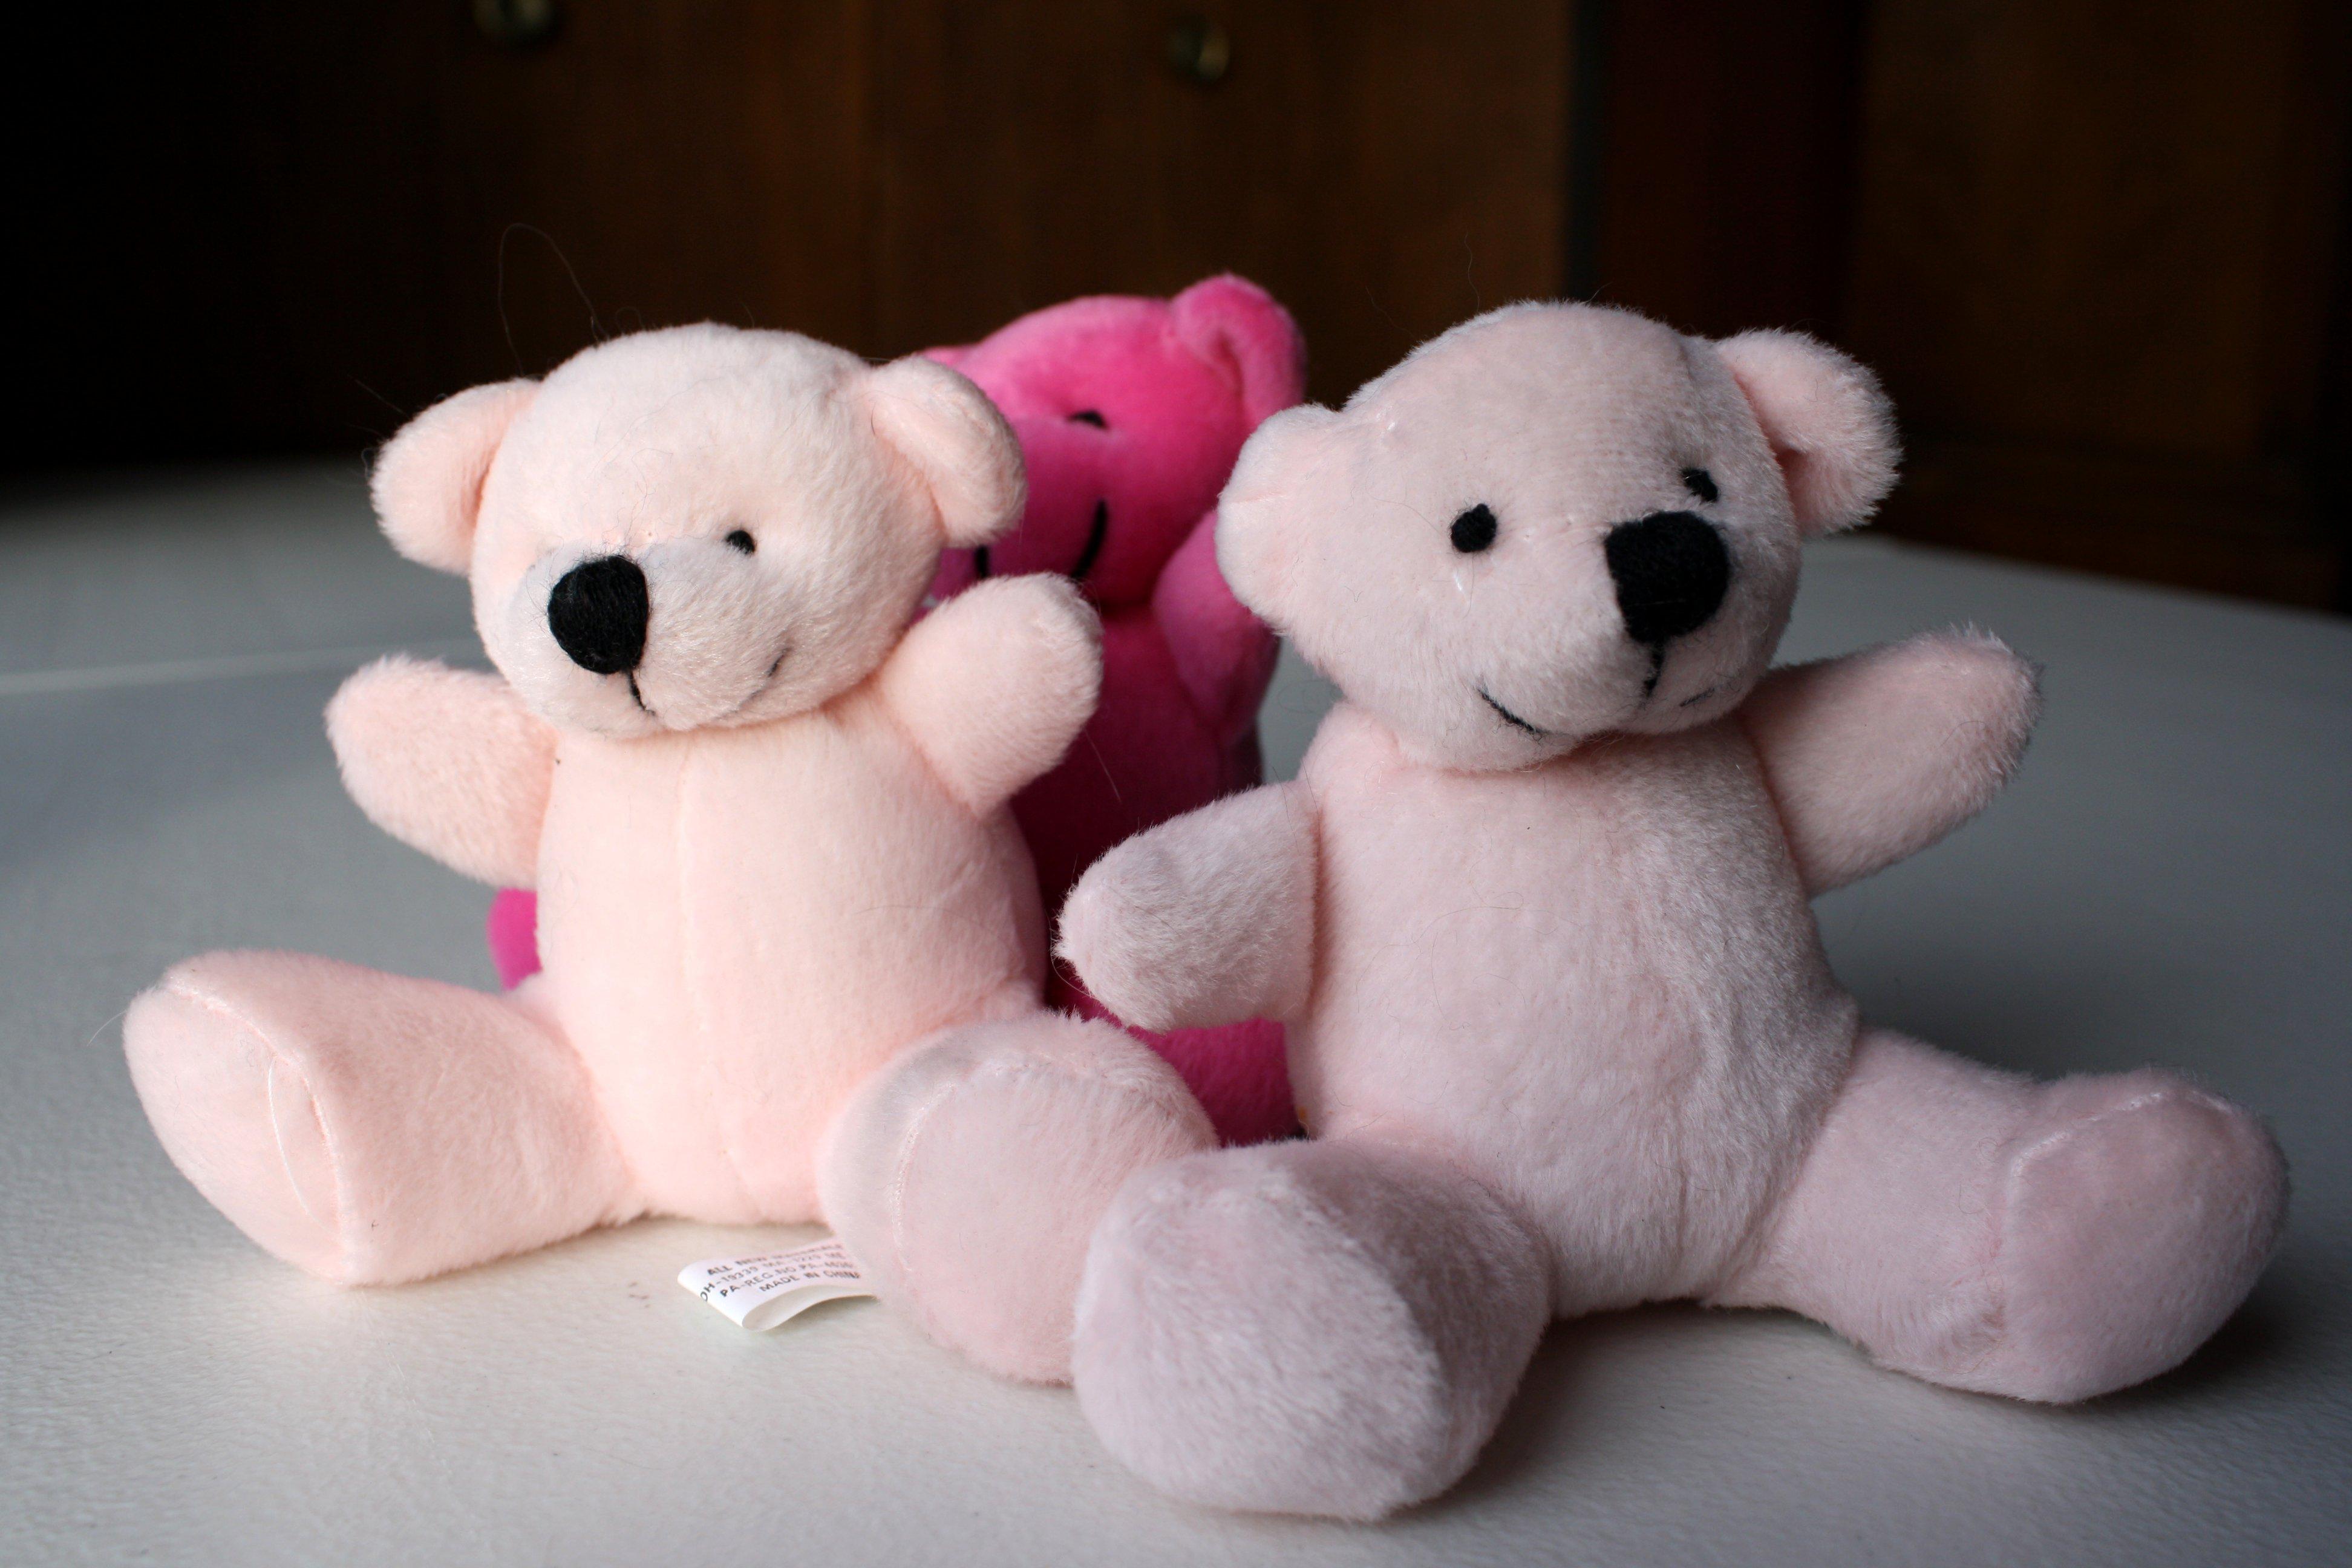 three teddy bears picture free photograph photos public domain